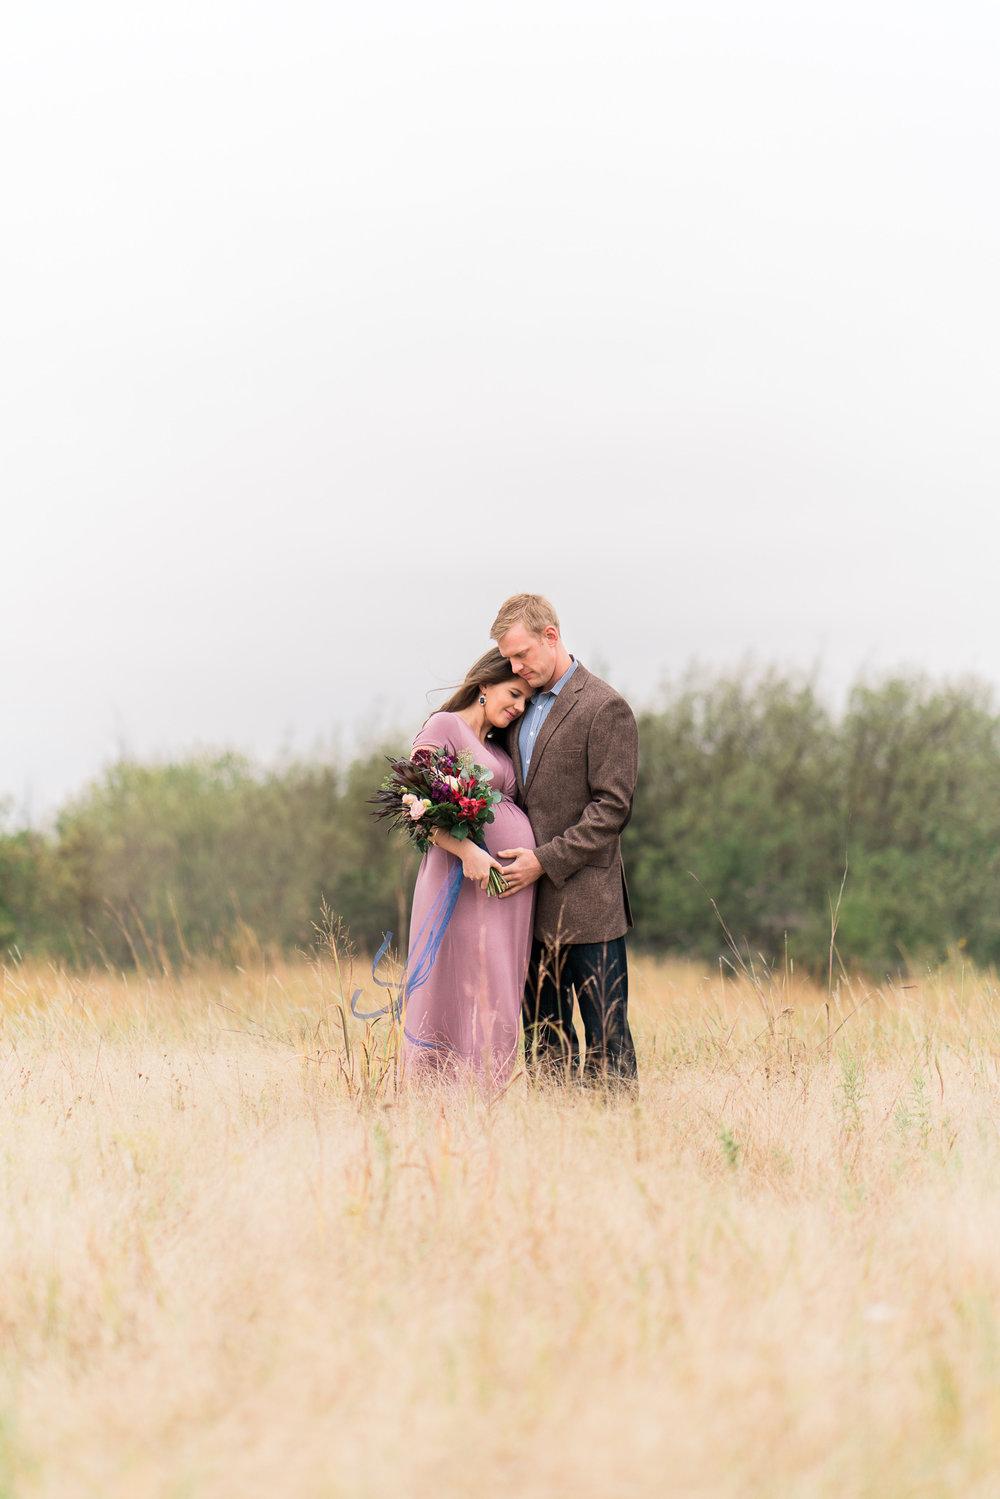 Lizanne-Andrew-Maternity-Kate-Bernard-Photography-Web-6.jpg